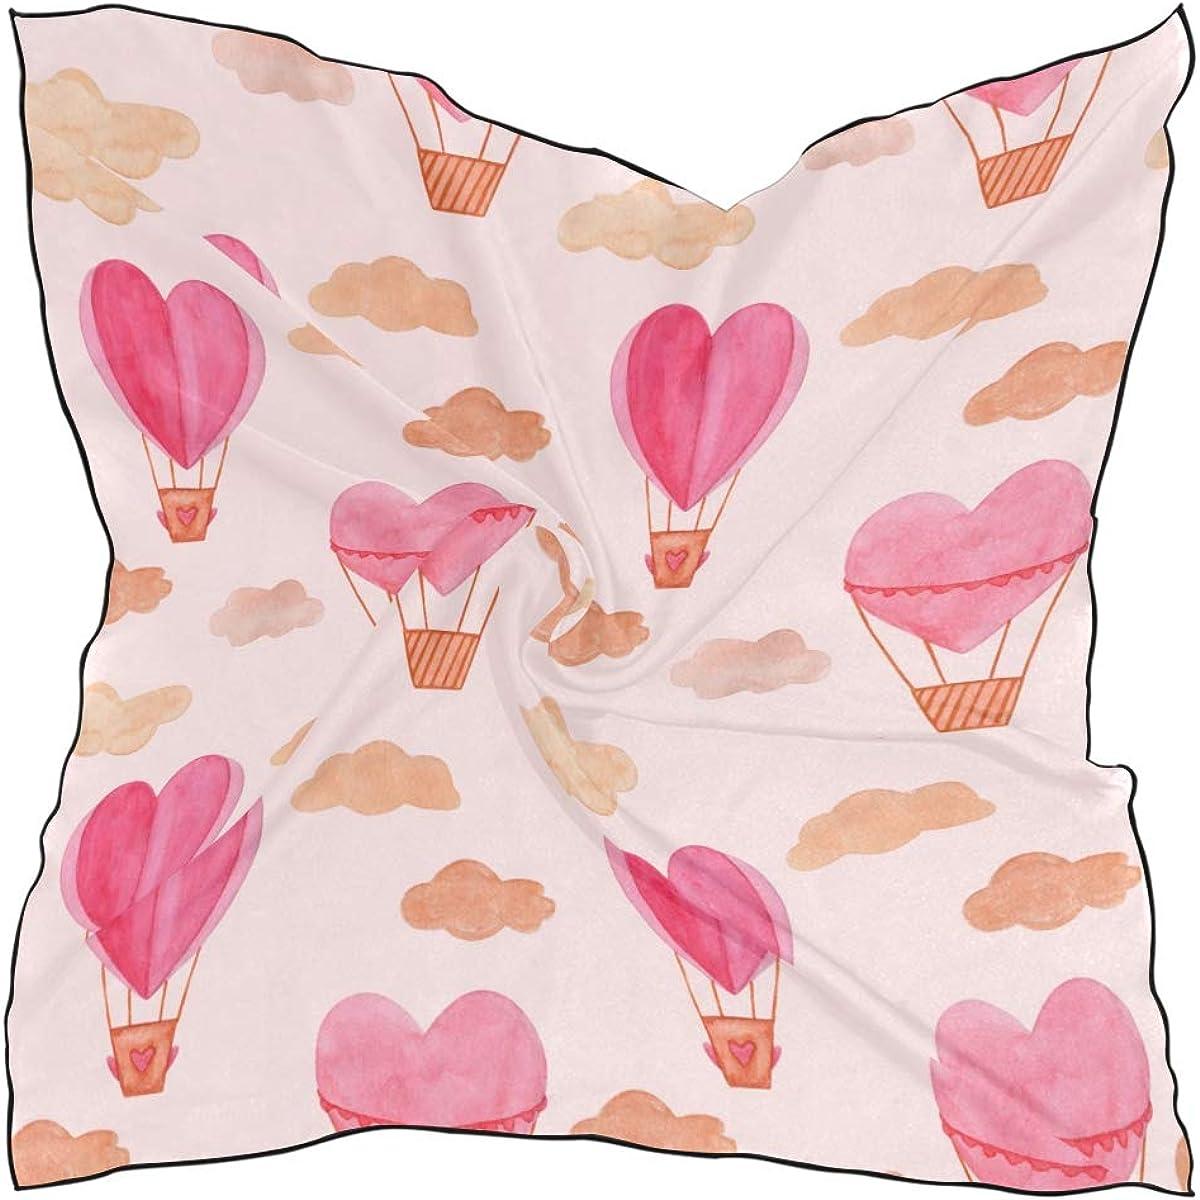 Soft Polyester Silk Scarf Fashion Print Cartoon Love Air Ballon Scarfs Women Head Scarf Travel Scarf Multiple Ways Of Wearing Daily Decor